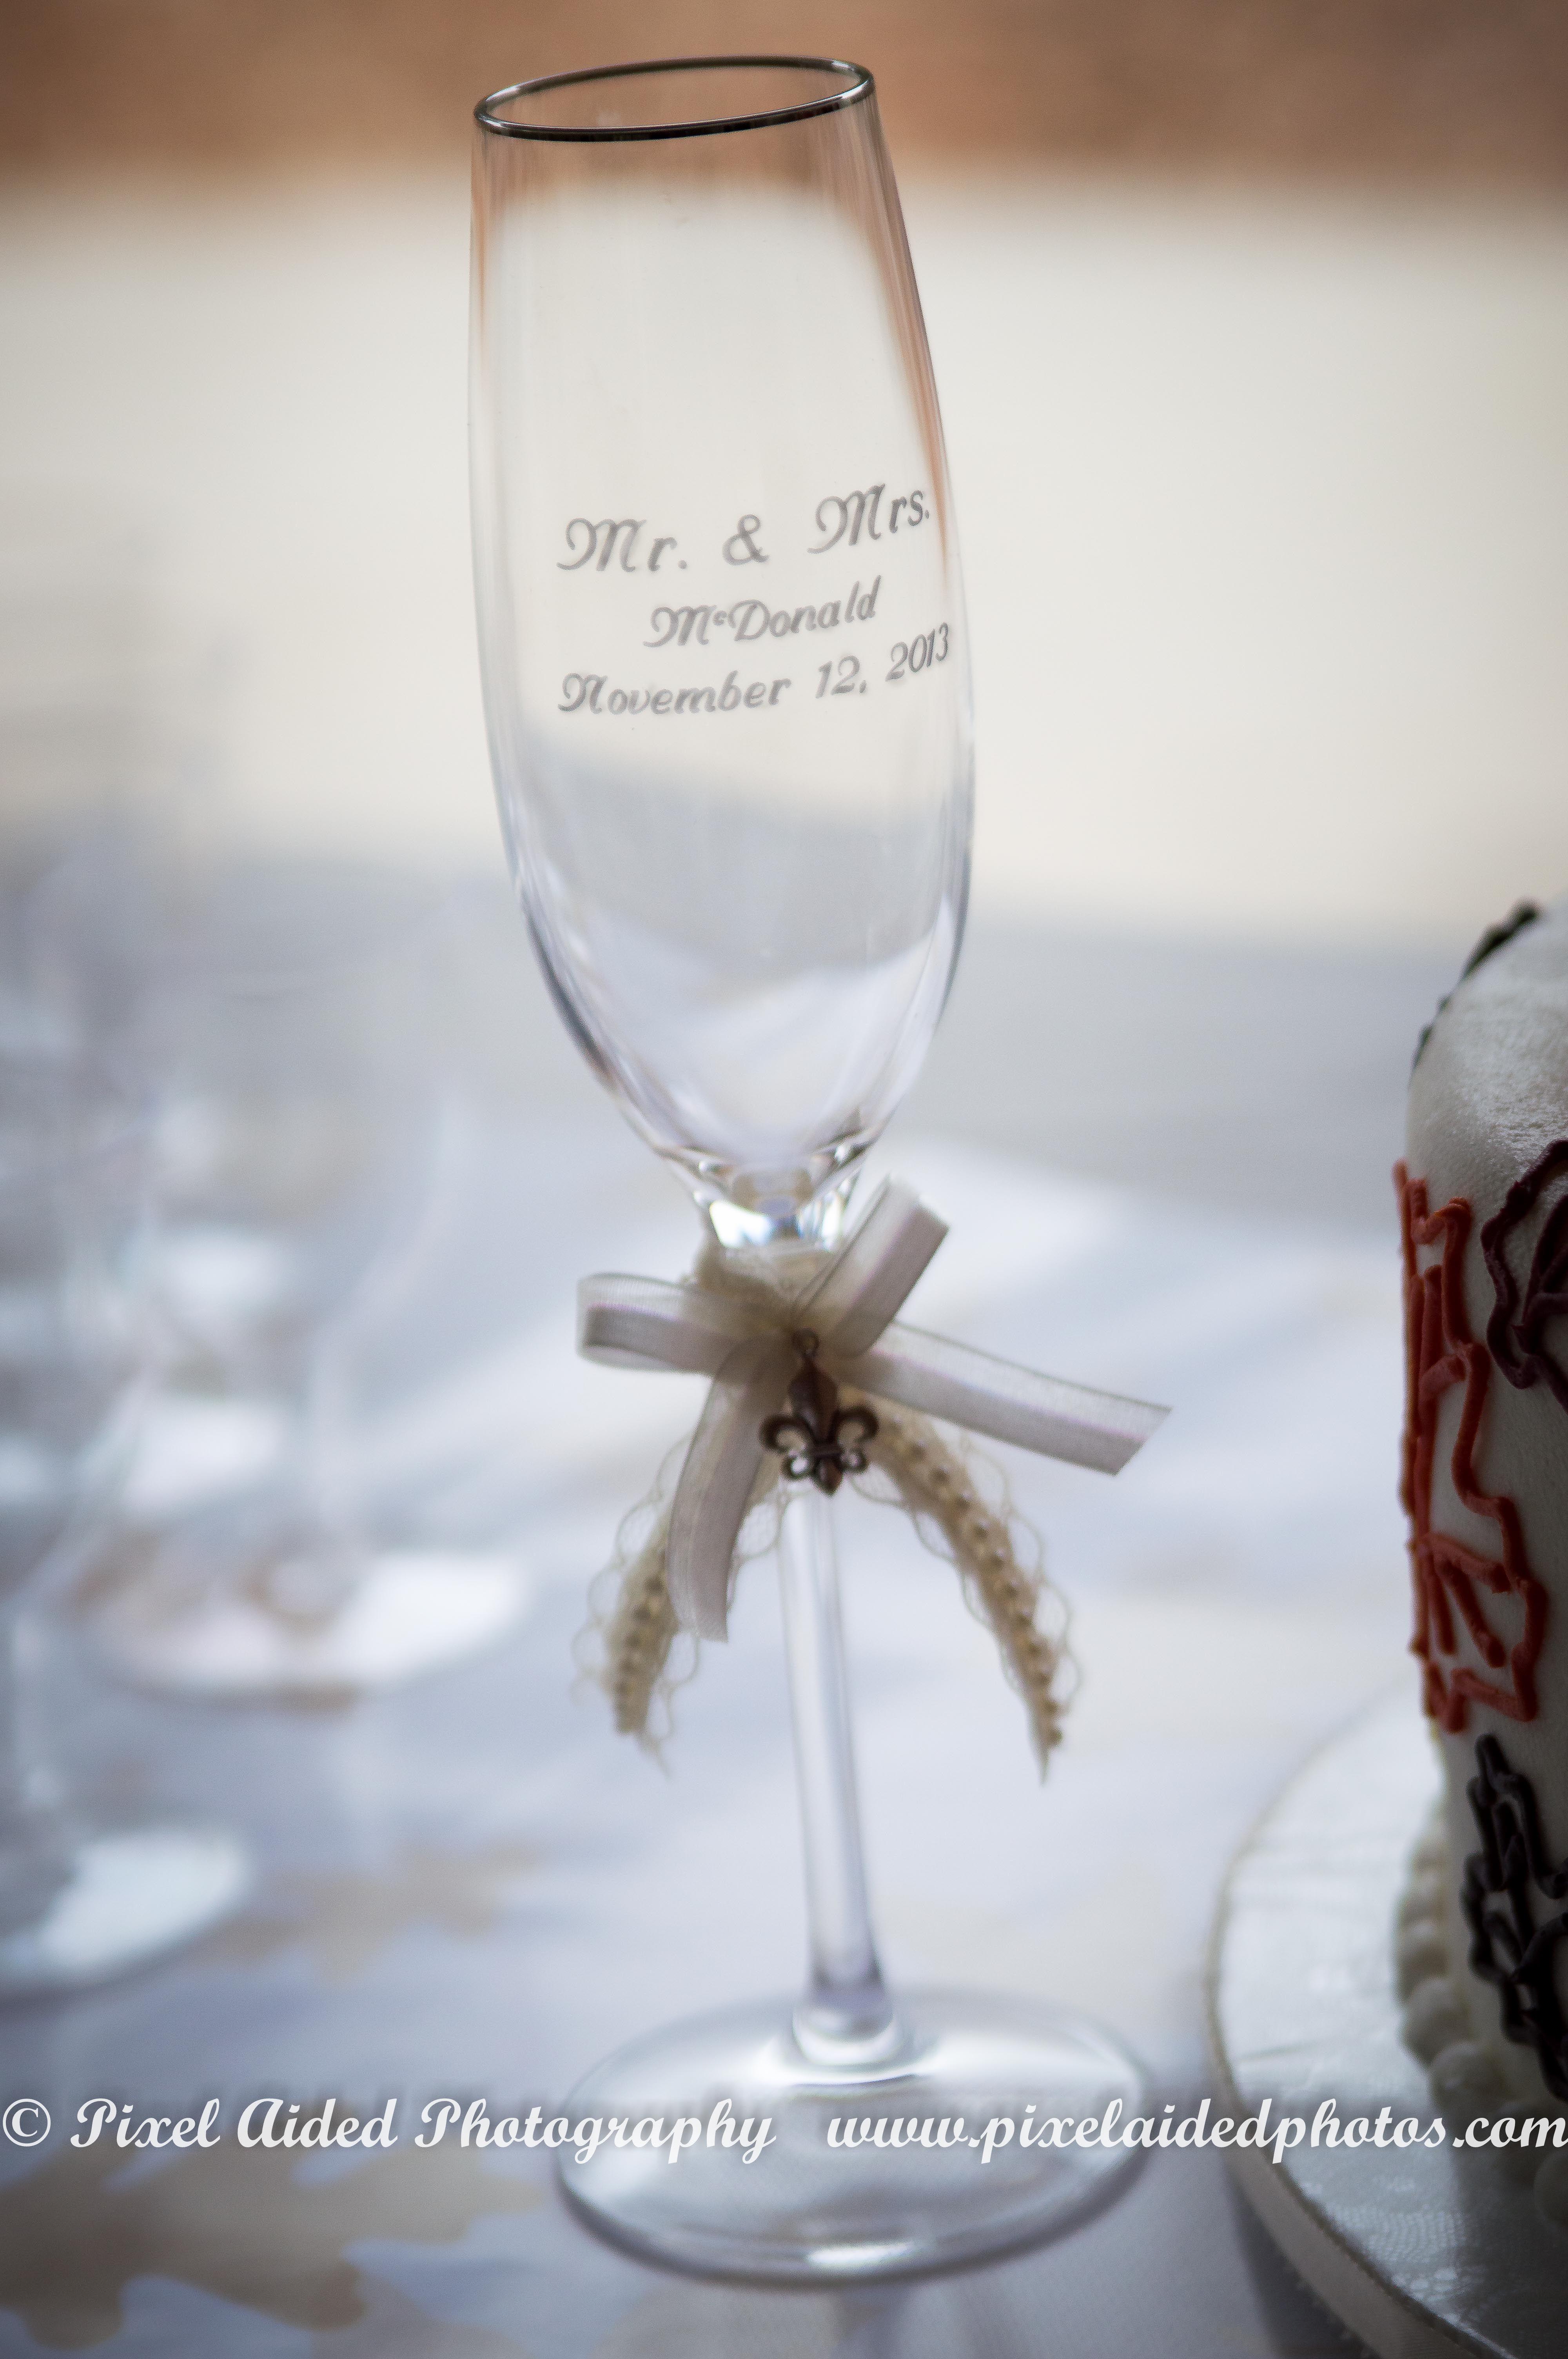 engraved champagne glasses wedding ideas, wedding gifts San Diego ...